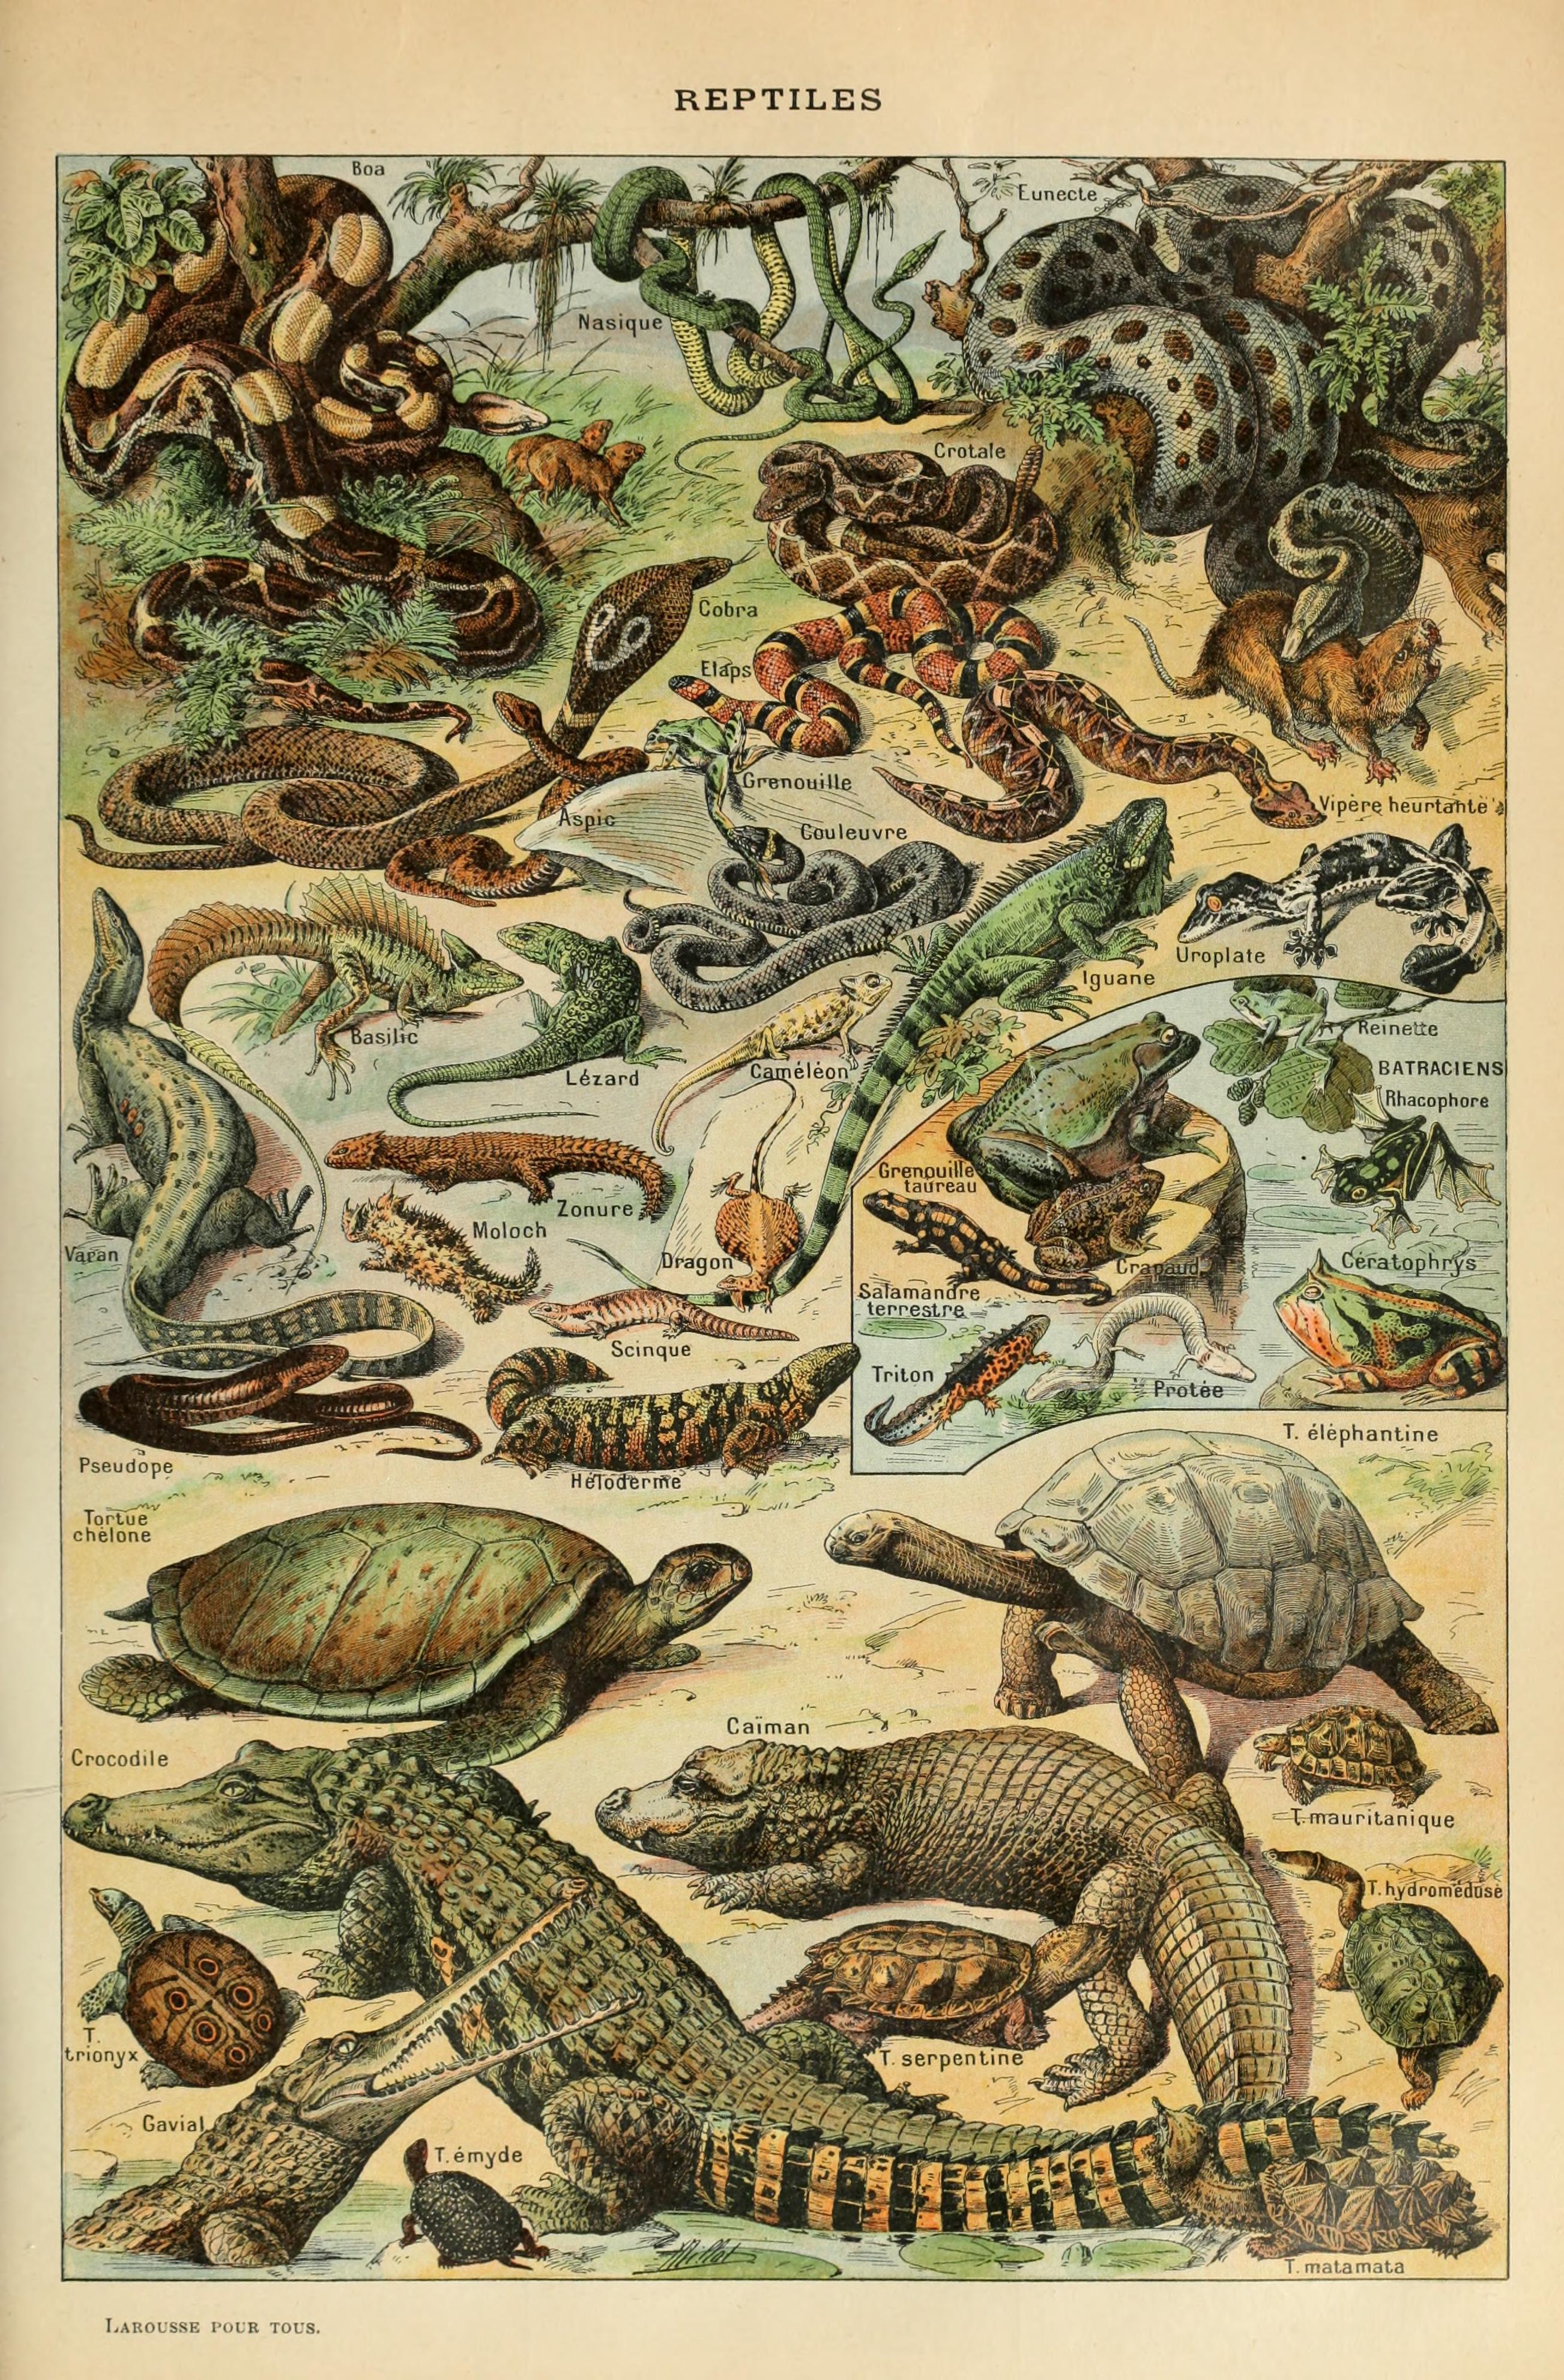 File:Adolphe Millot reptiles-pour tous.jpg - Wikimedia Commons